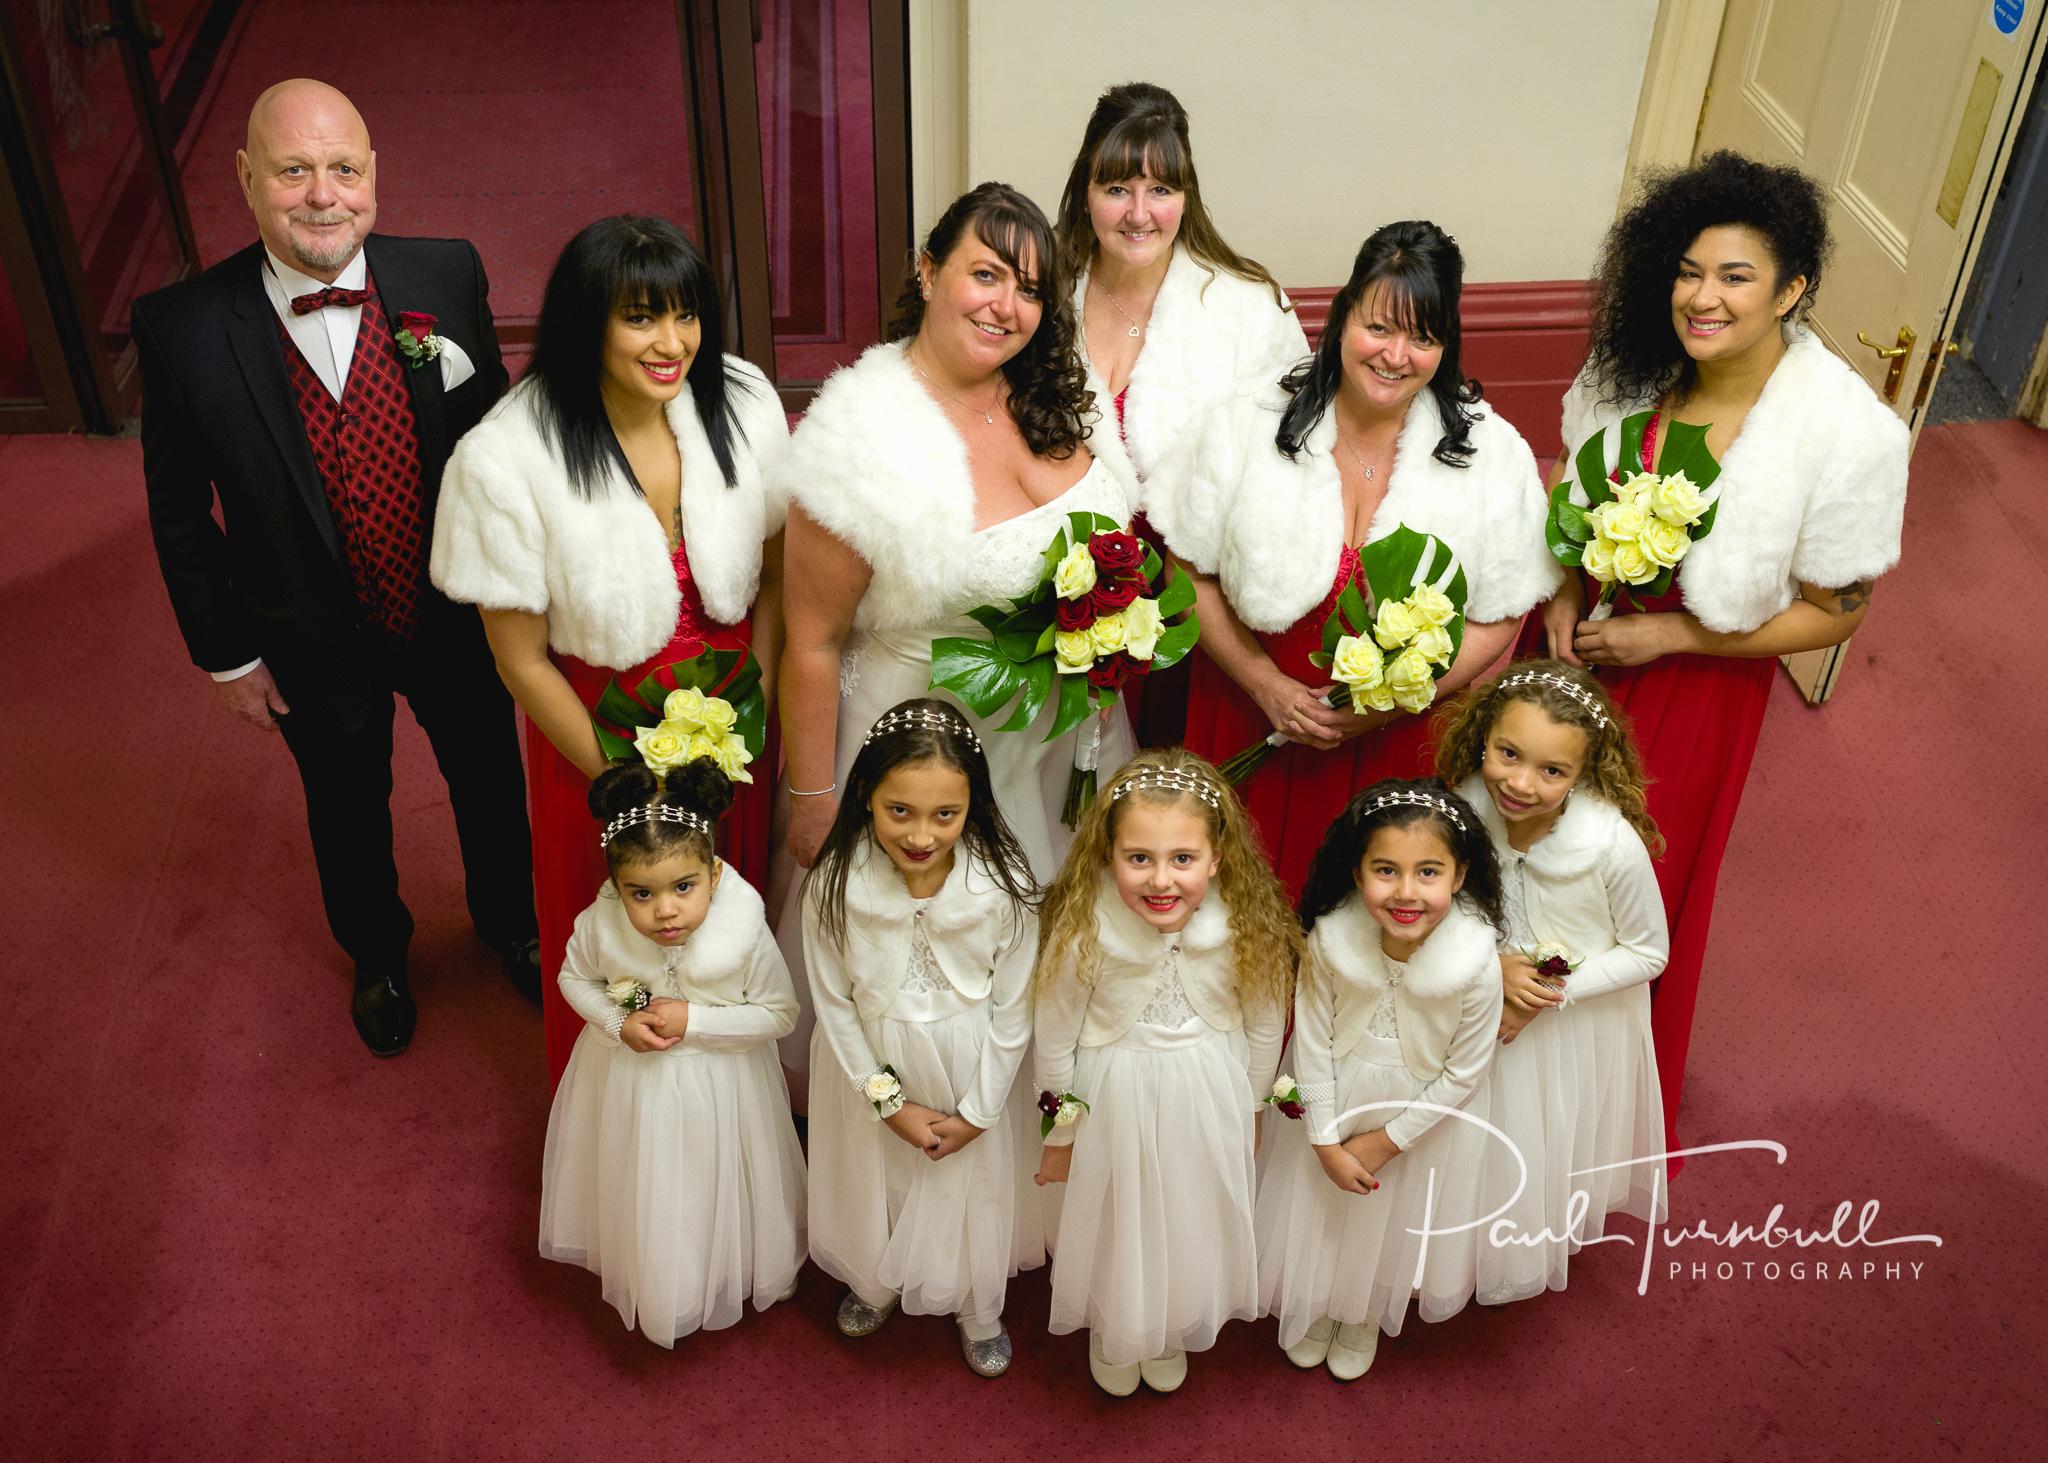 wedding-photographer-leeds-town-hall-016.jpg